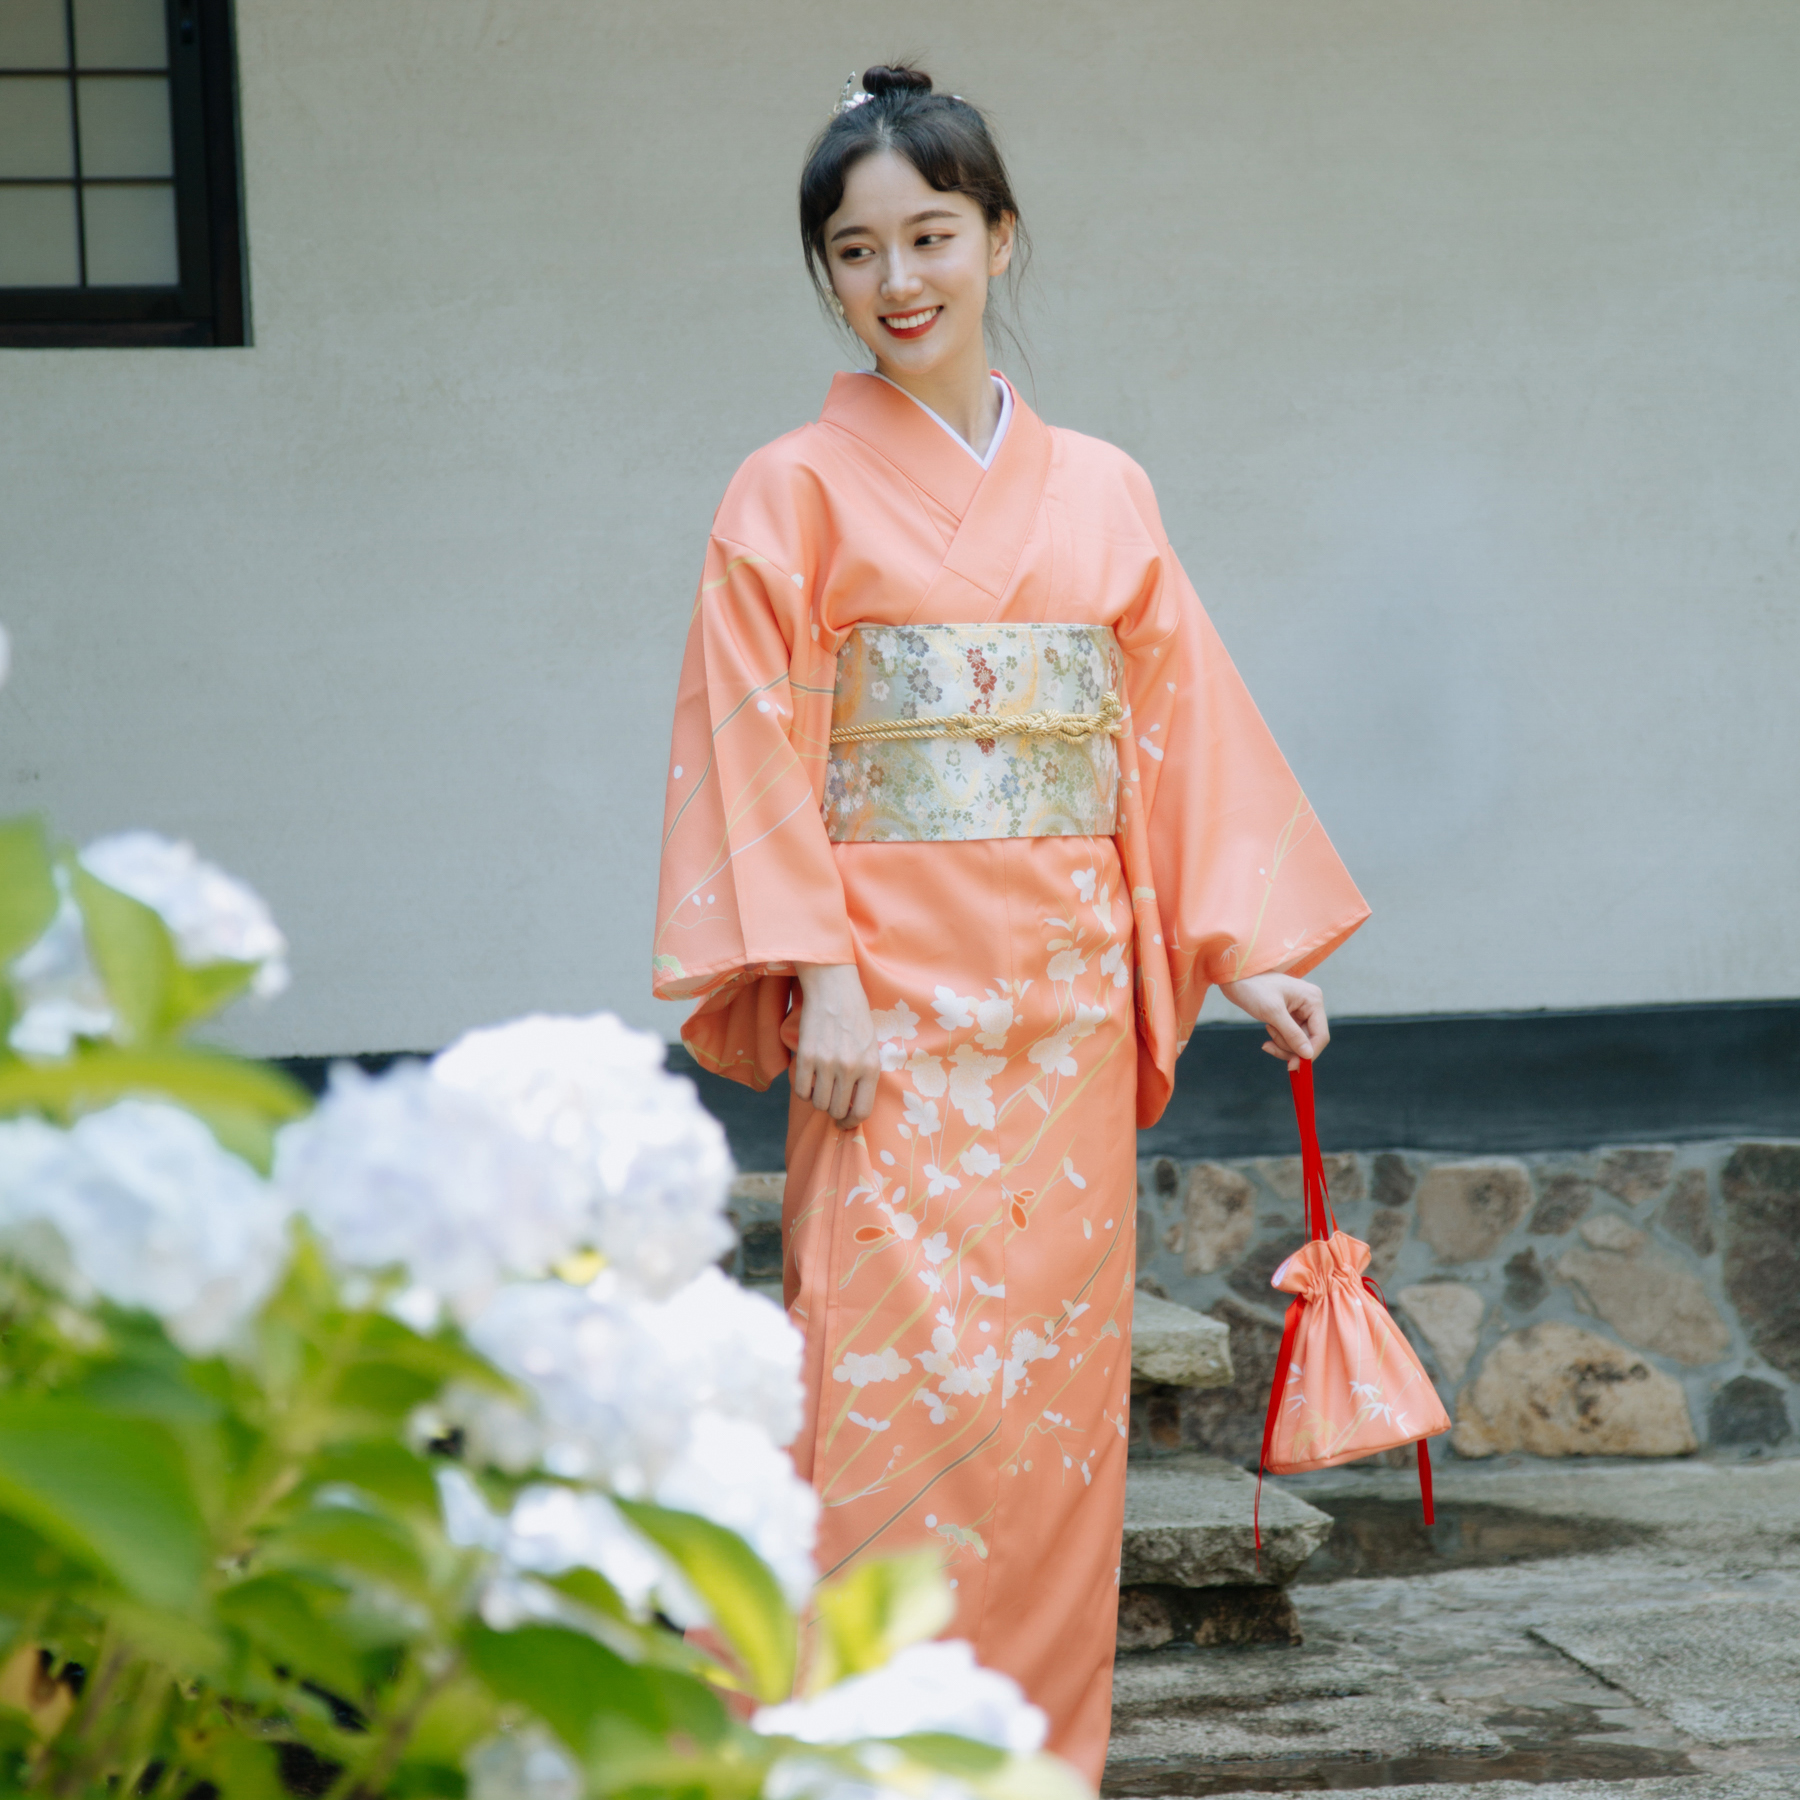 High Quality Japanese traditional kimono take photo dress cosplay female yukata women haori Japan geisha costume obi kimonos